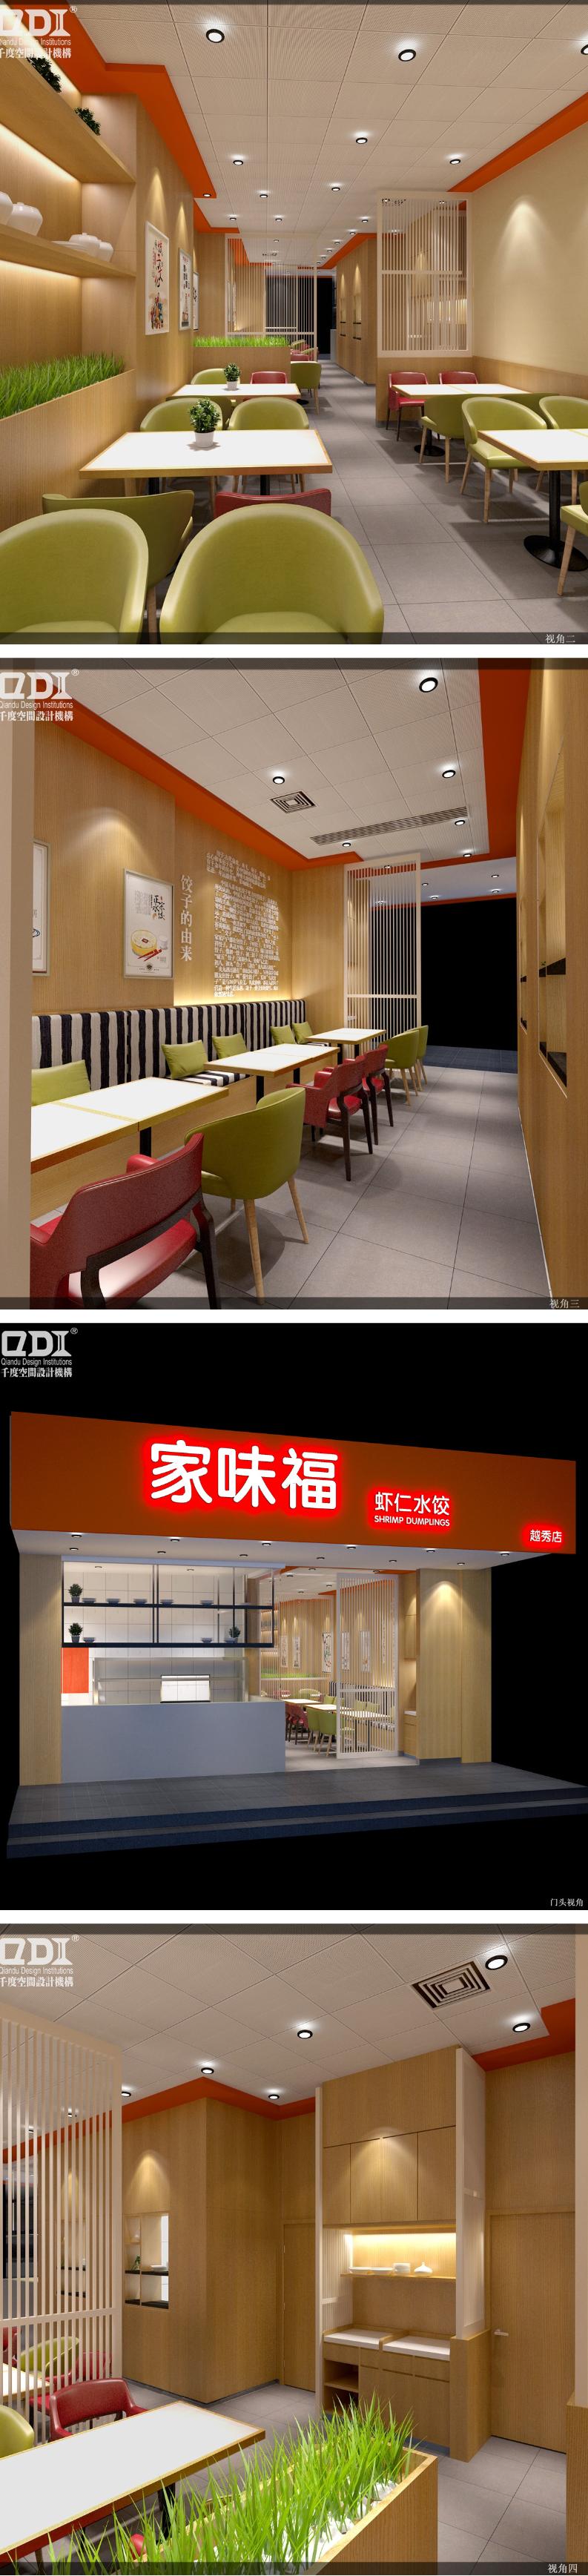 家味福饺子1.png